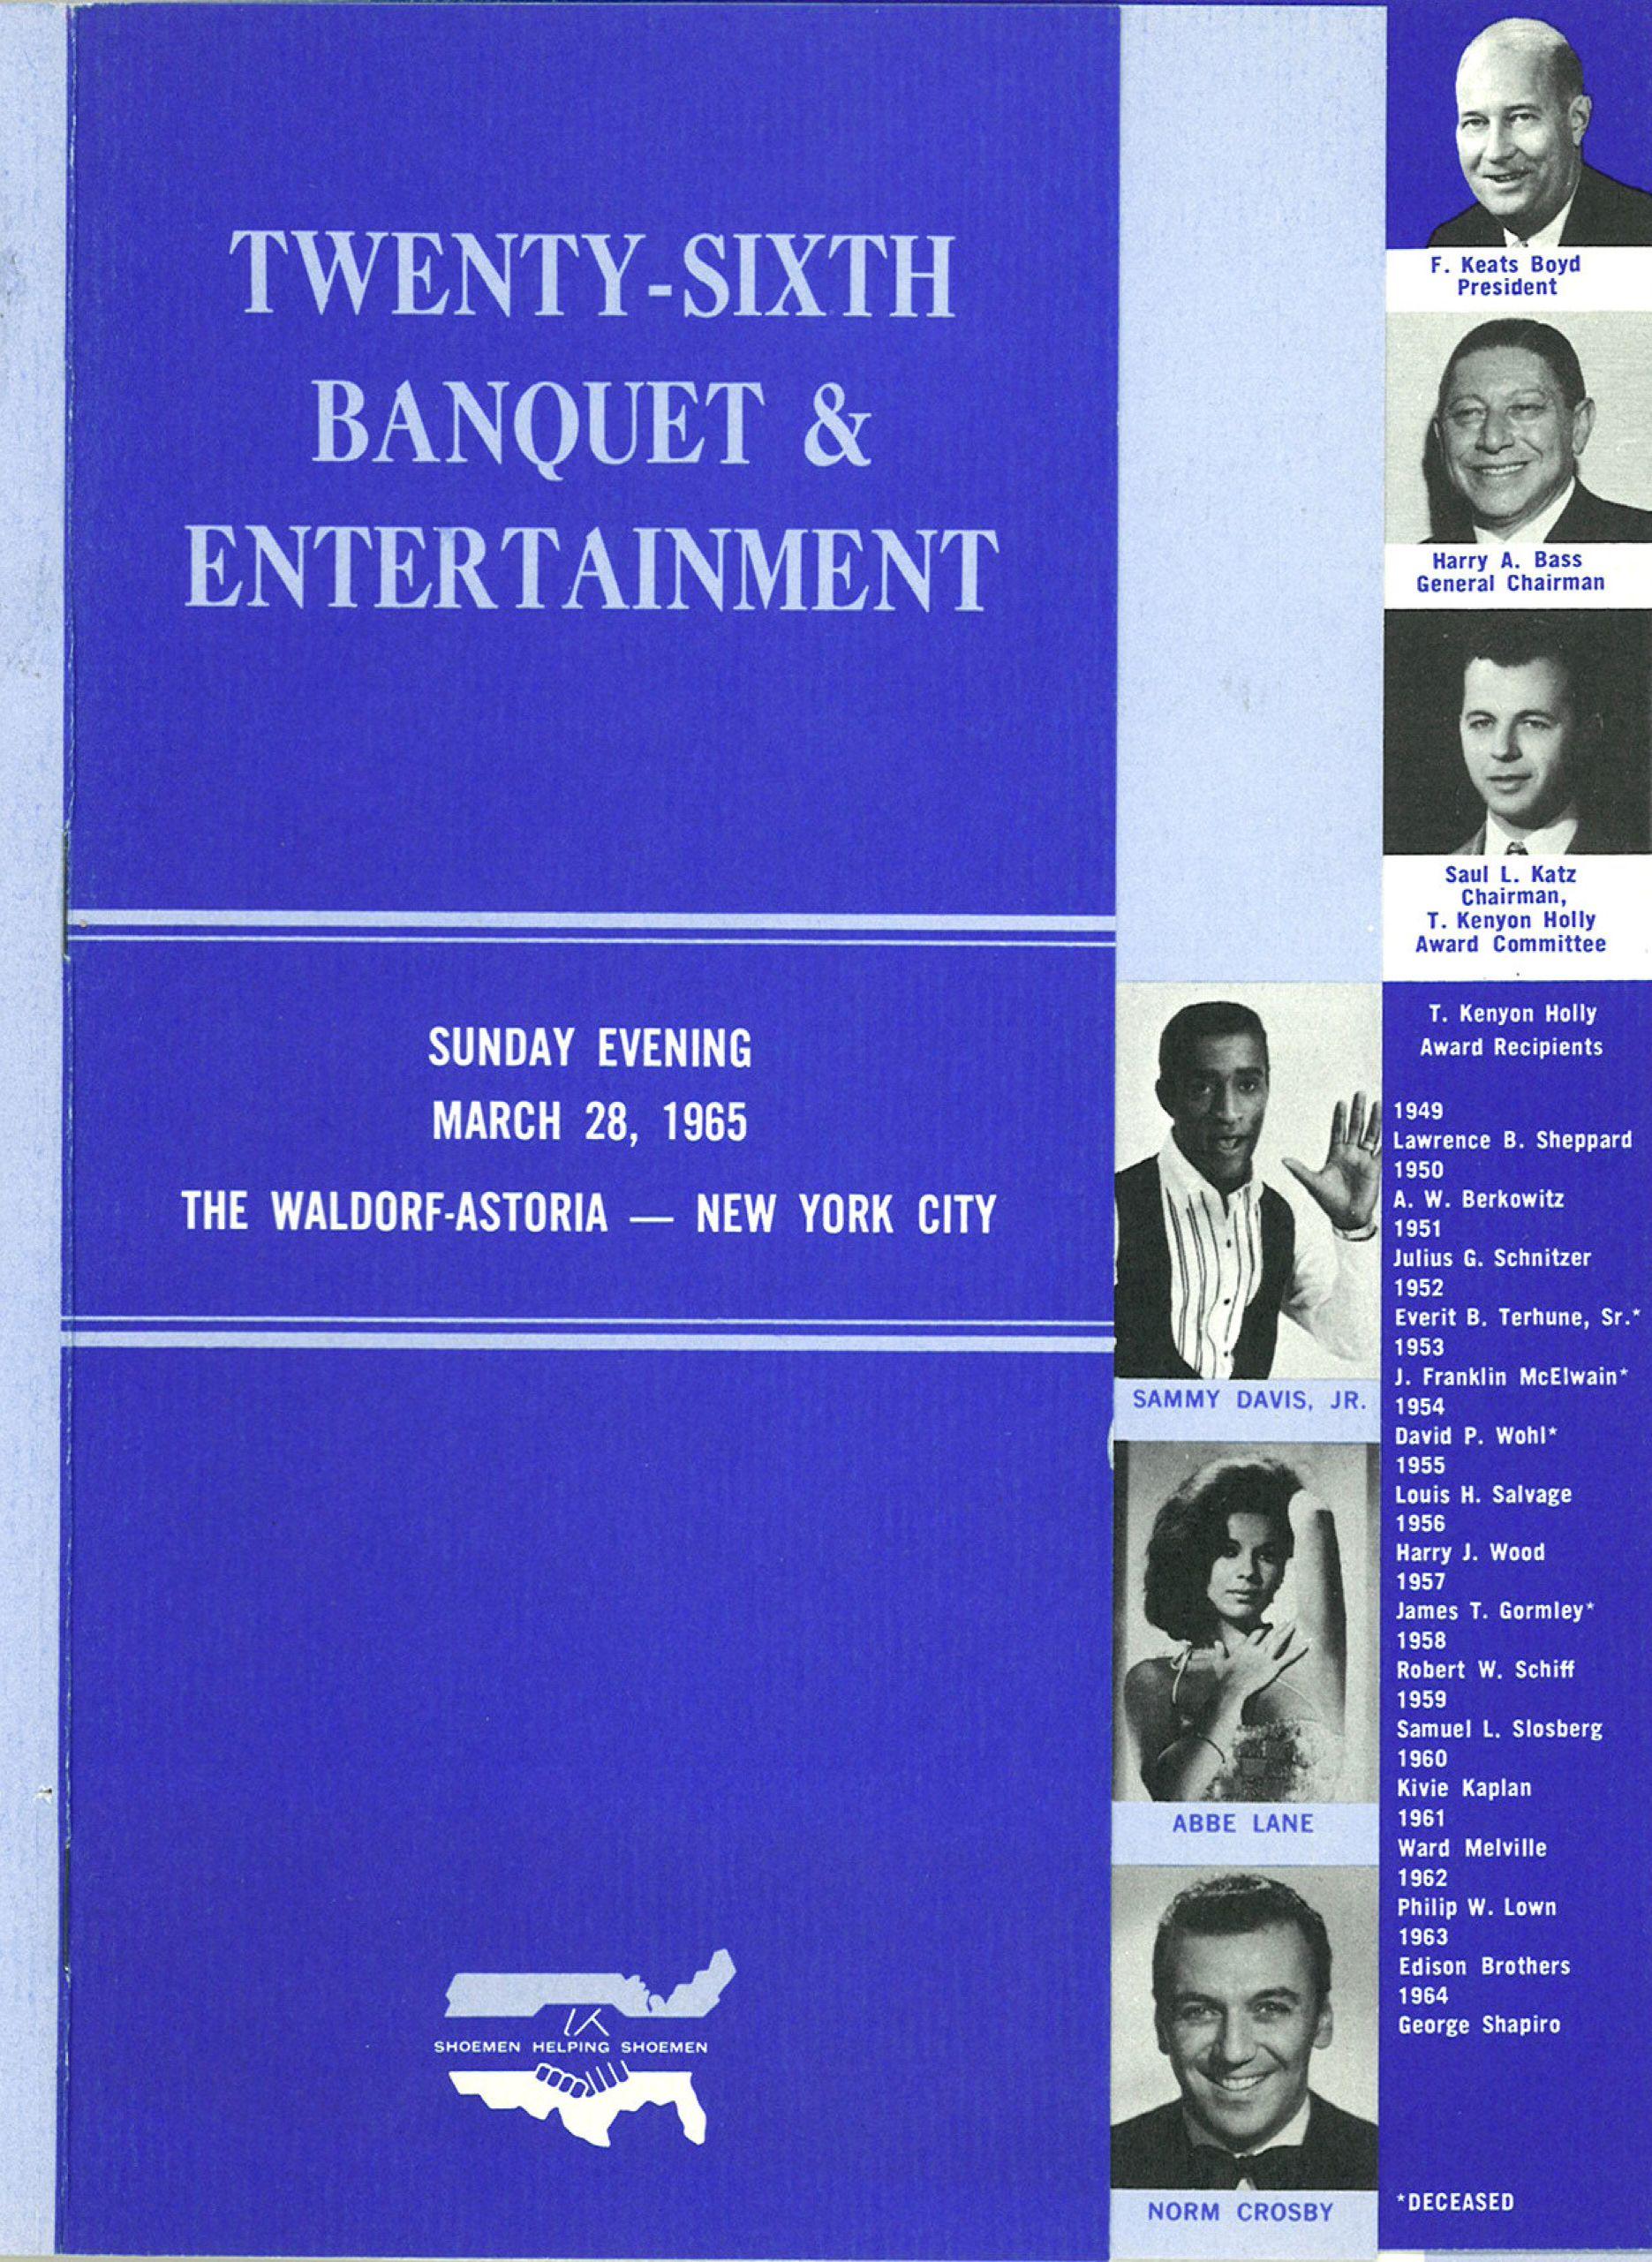 Cover of the Banquet program highlighting Sammy Davis Jr.